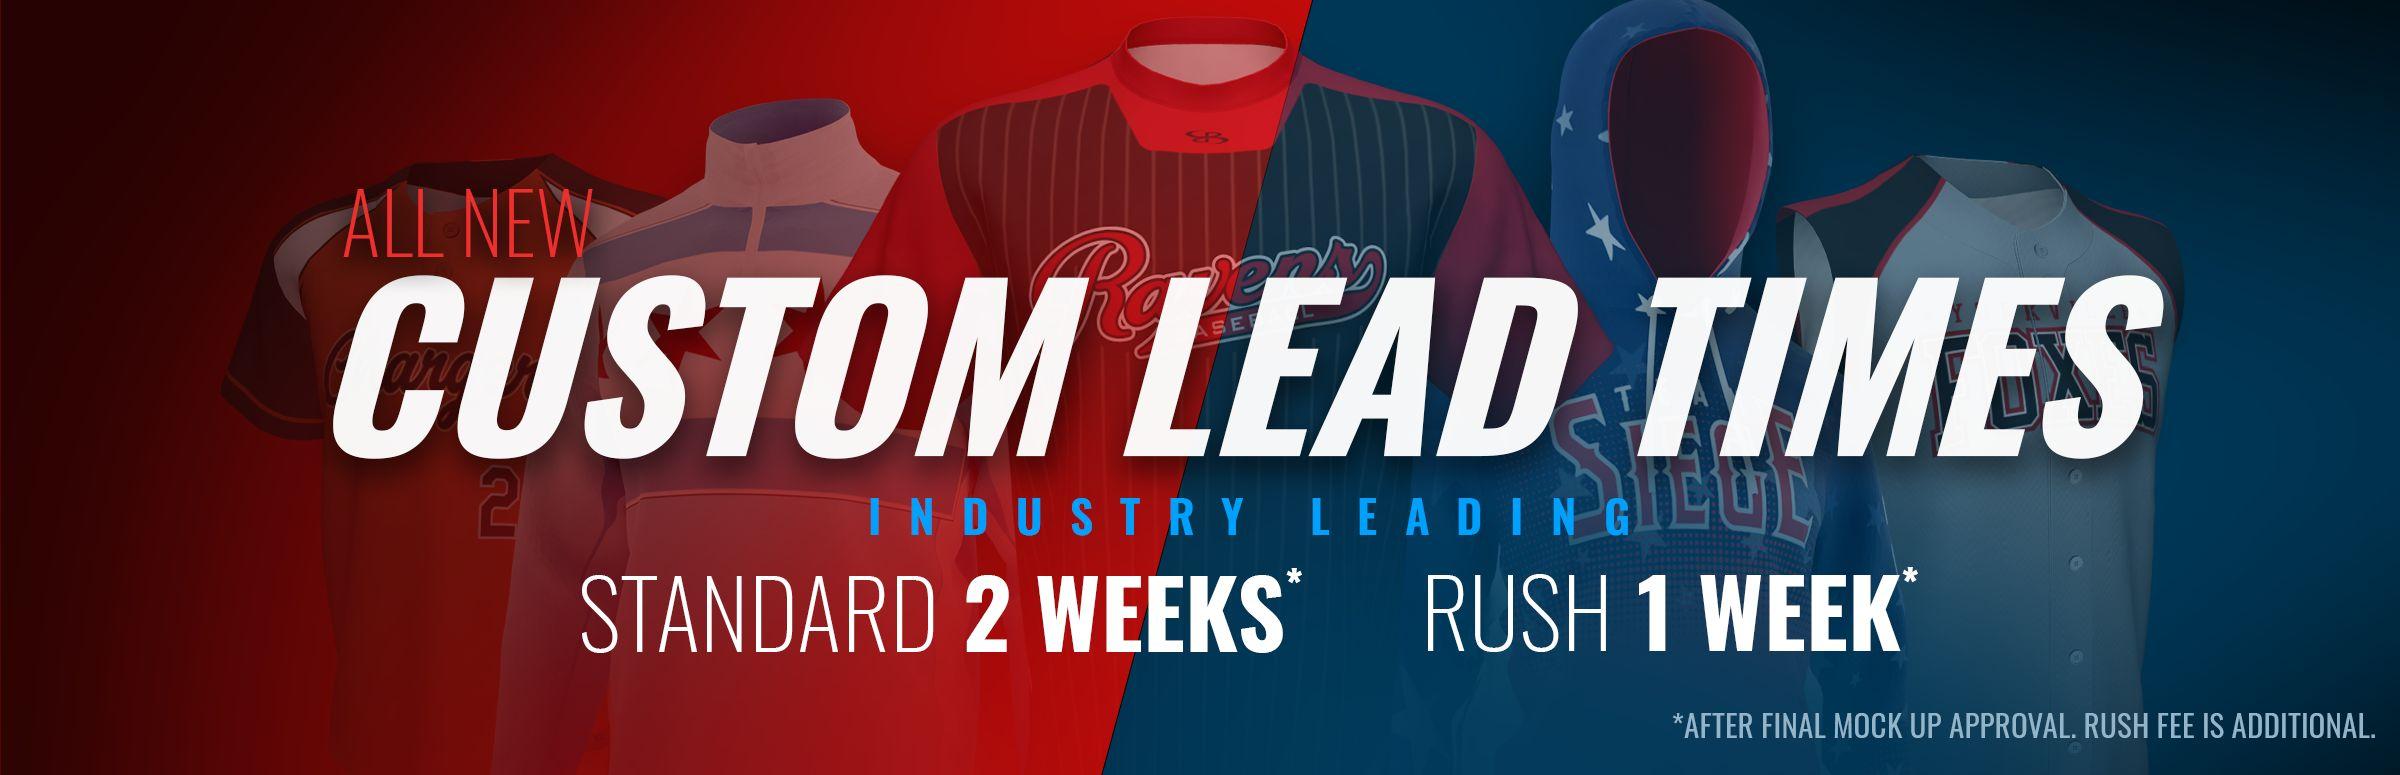 Custom Lead Times - Standard 2 Weeks